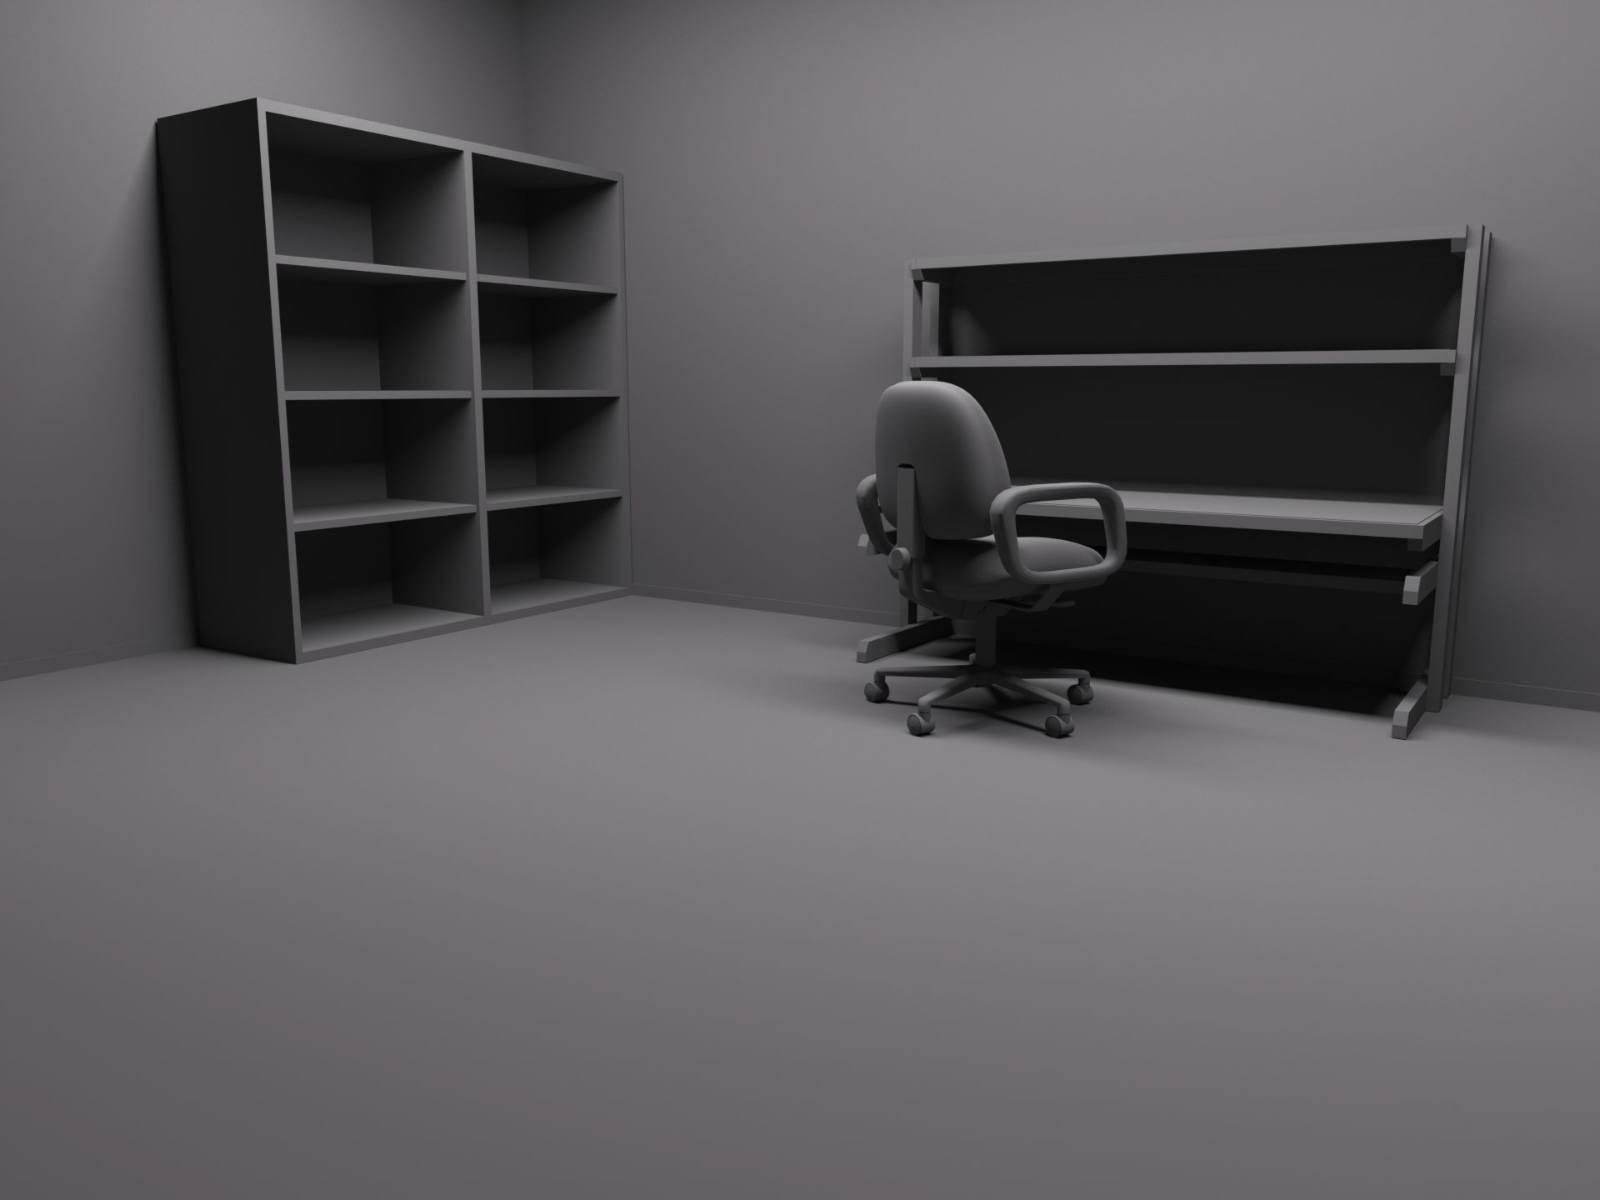 Office Desktop Hd Wallpapers Wallpaper Cave